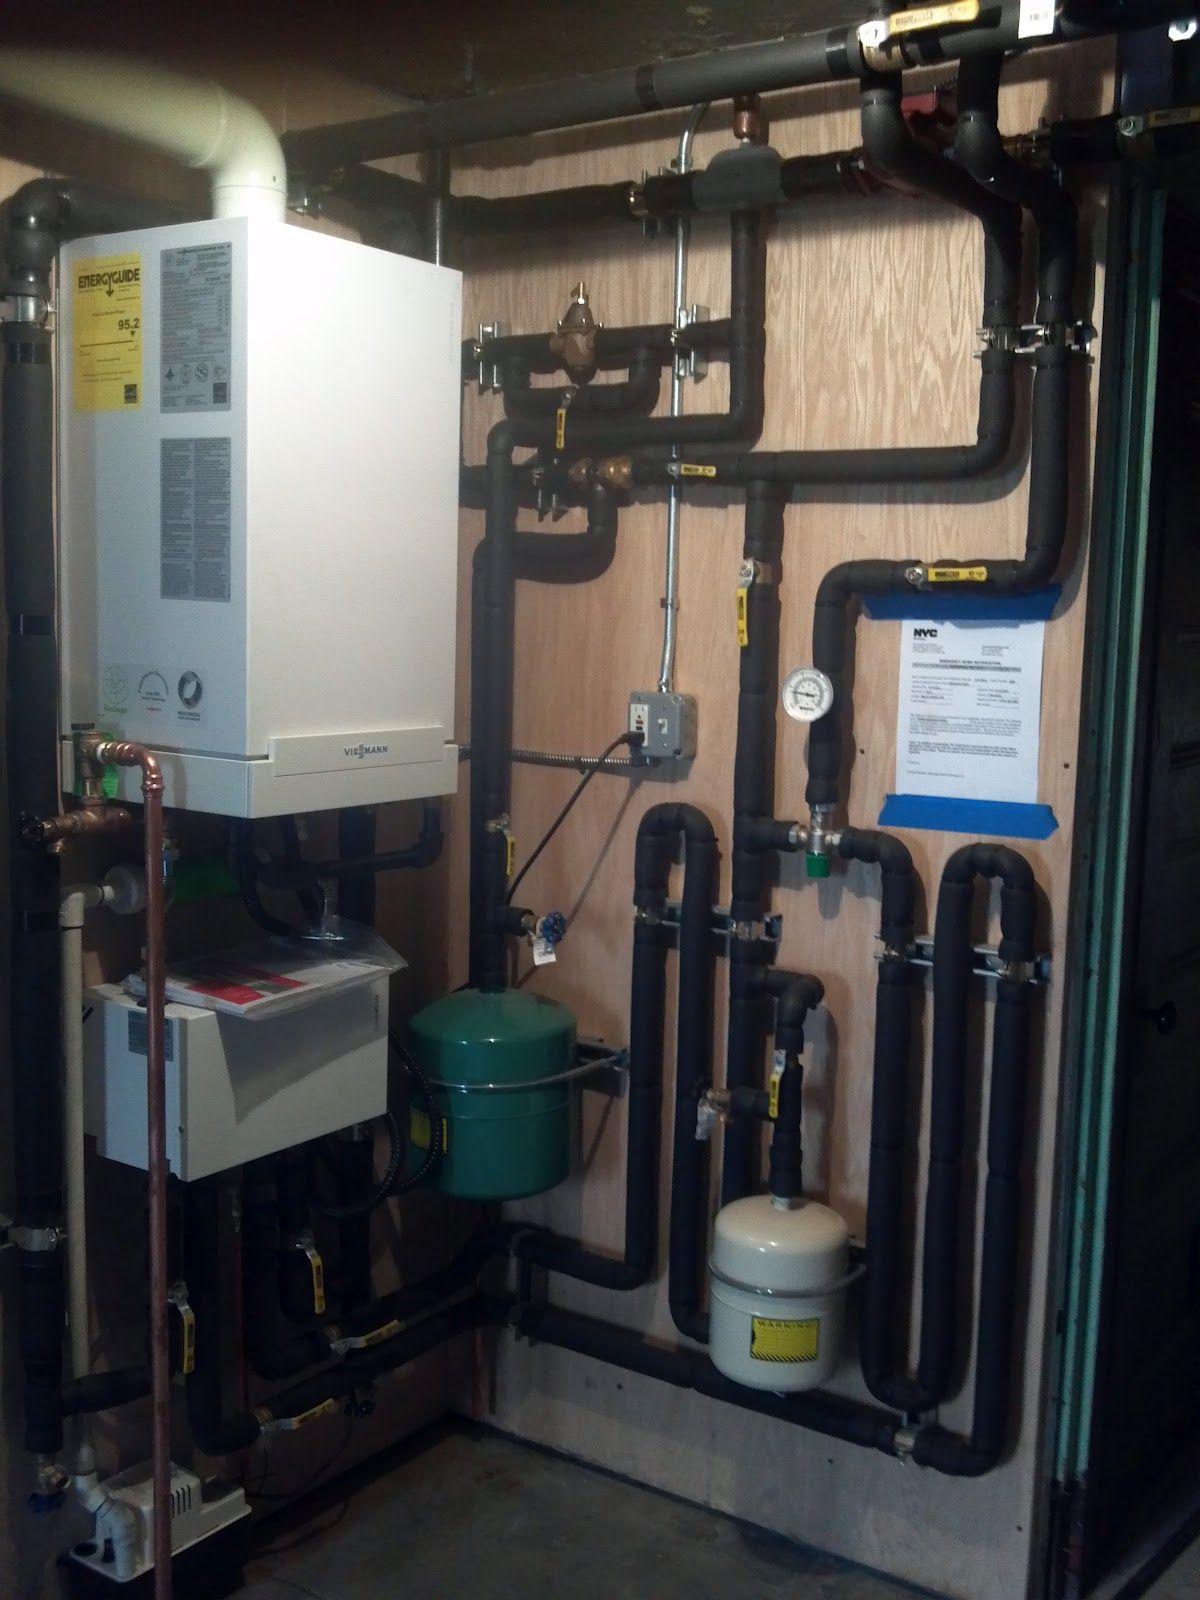 Viessmann Vitodens Combi Plus Boiler Installation